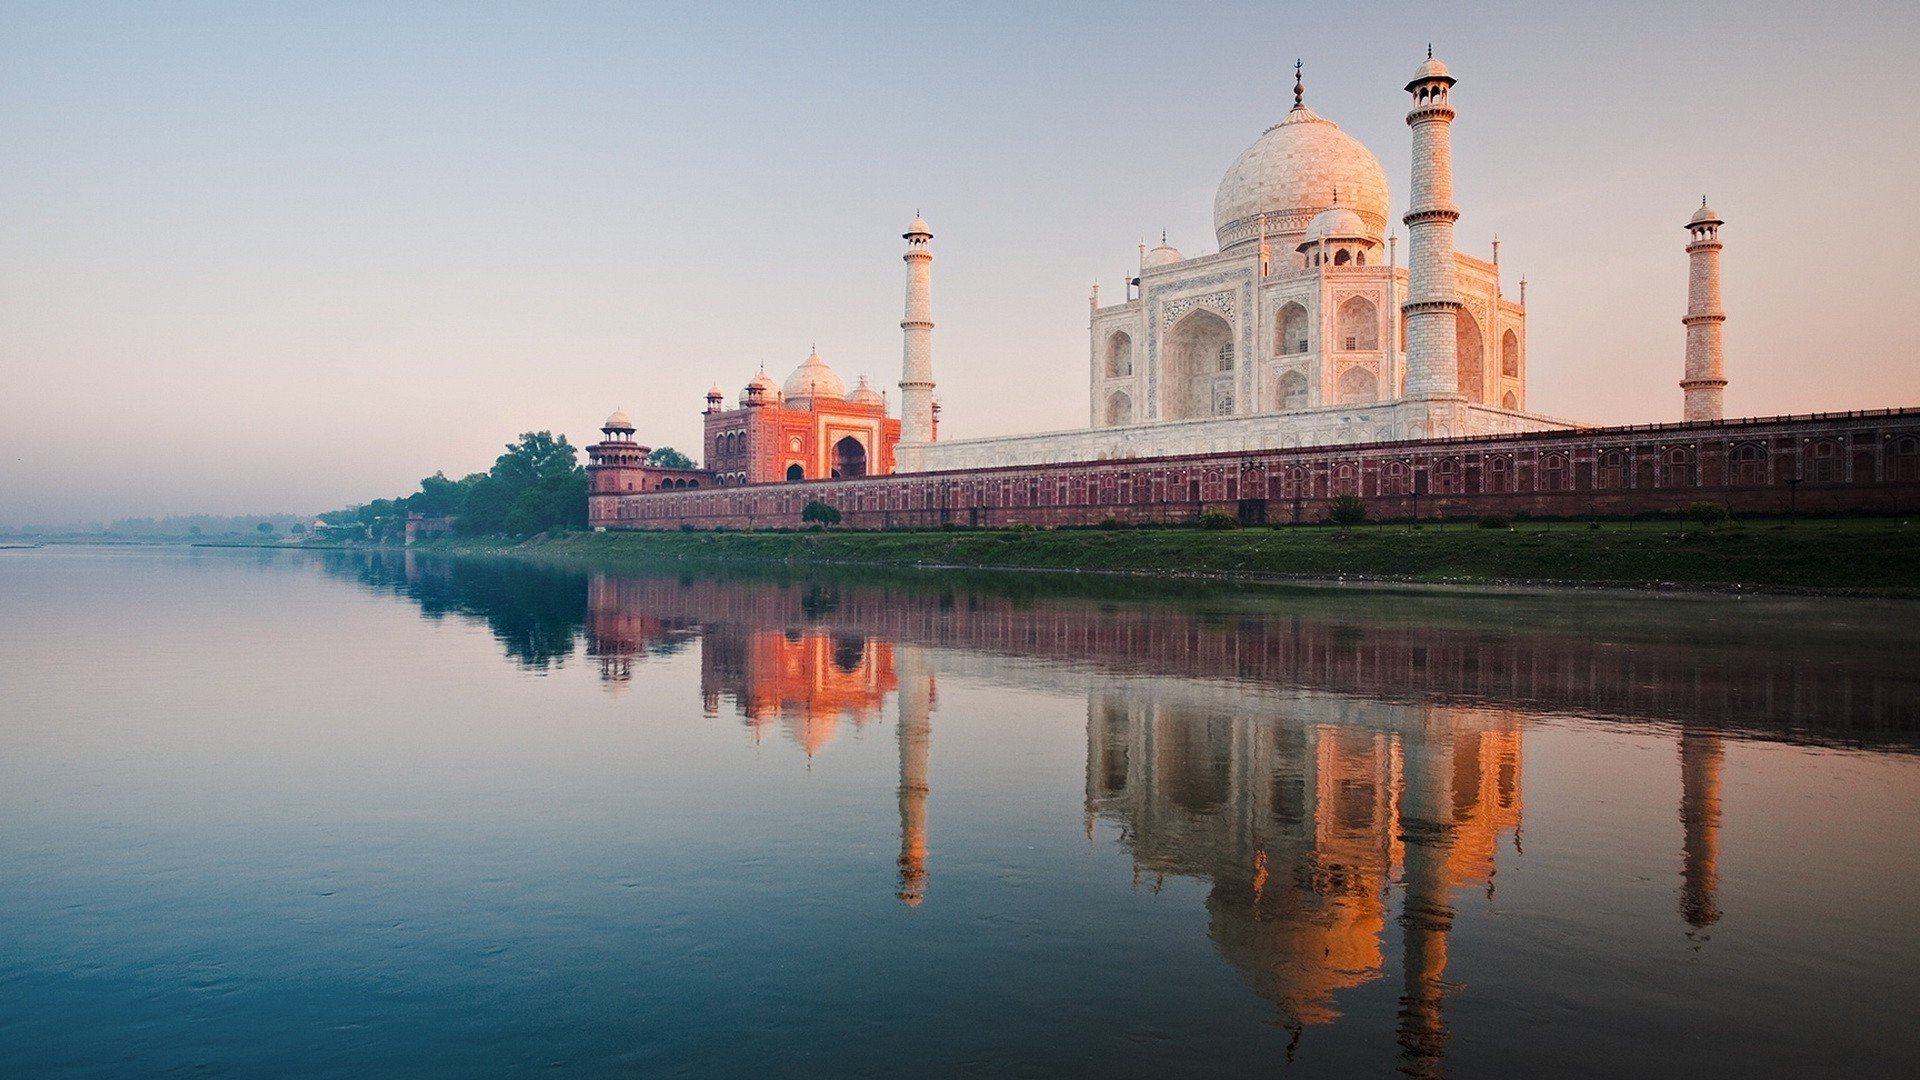 taj mahal river, hd world, 4k wallpapers, images, backgrounds